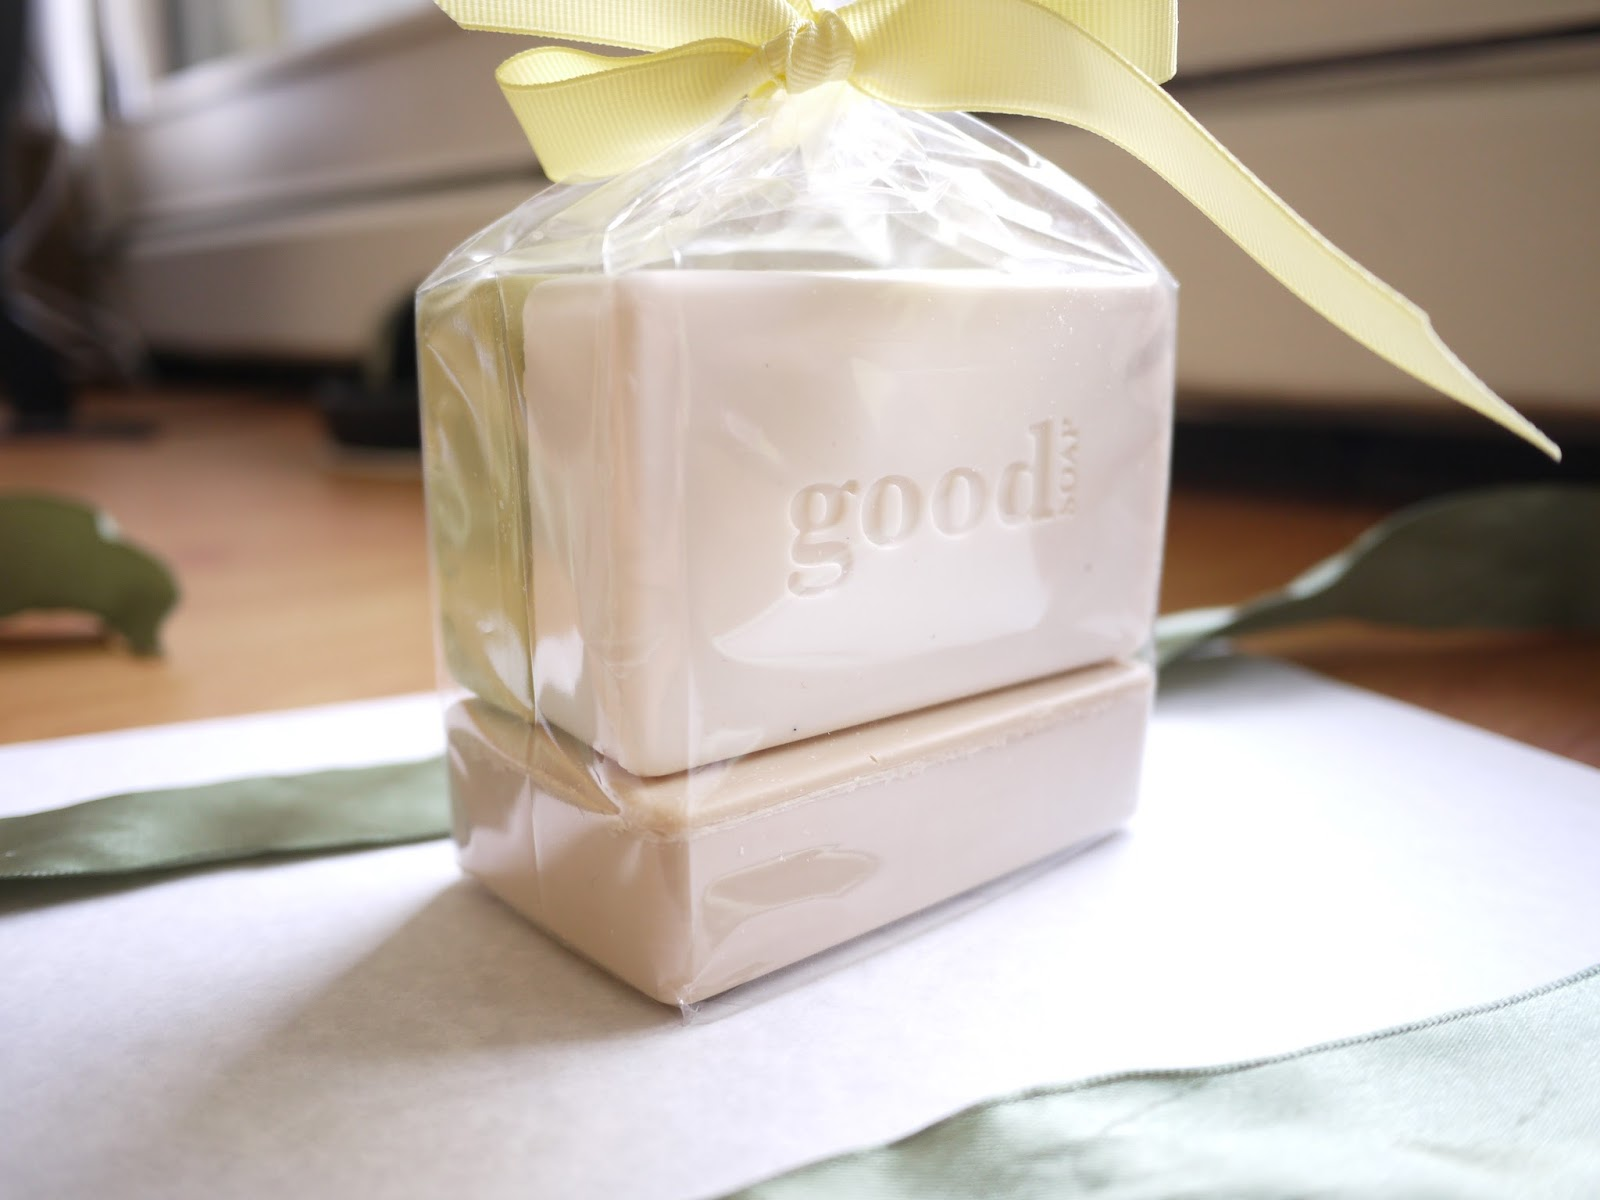 Good Soap by Alaffia vanilla coconut mint soap review